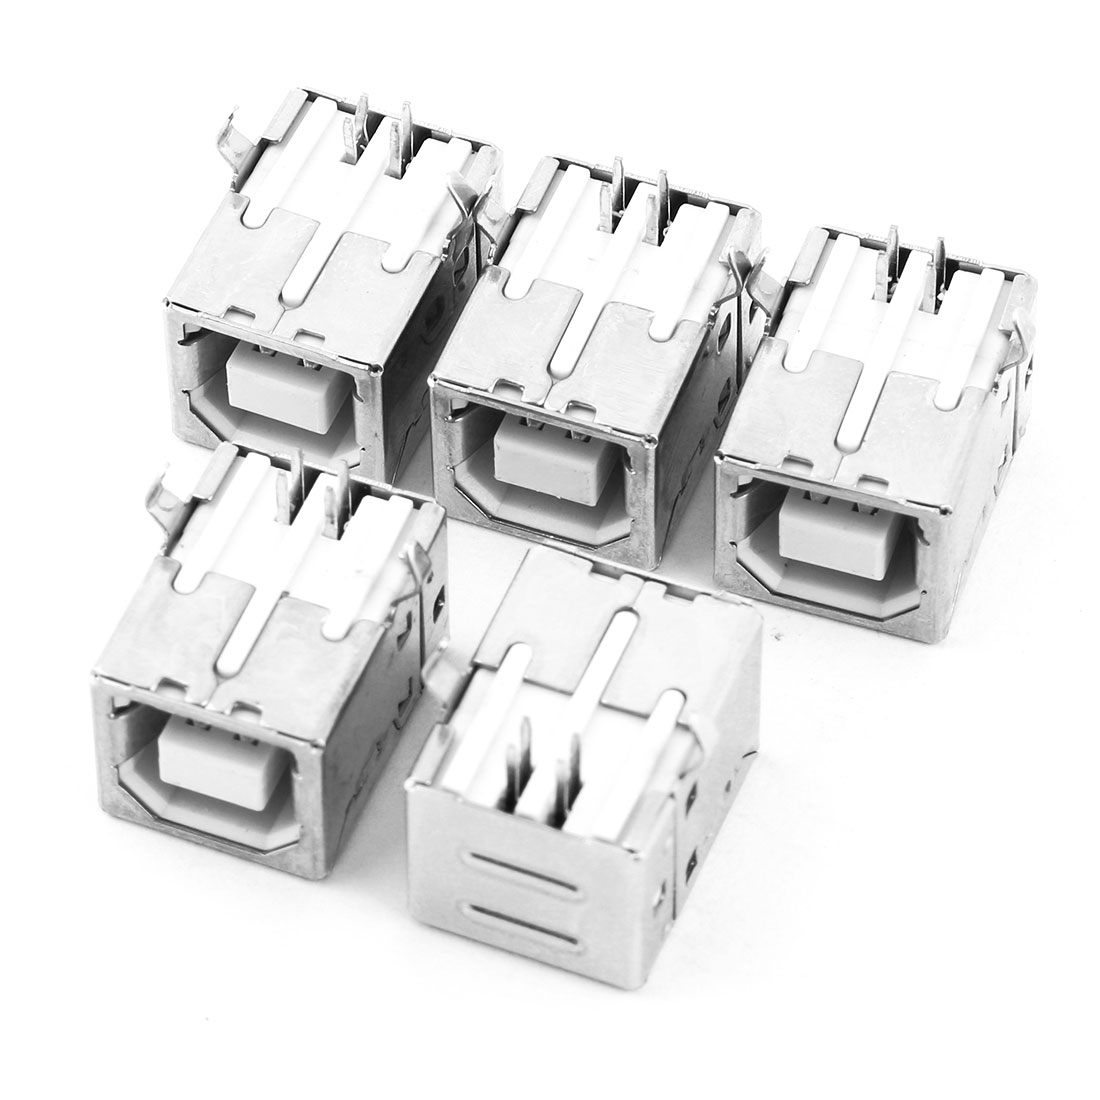 USB 2.0 Female Type-B Port 4-Pin 90 Degree PCB DIP Jack Socket Connector Silver Tone 5pcs